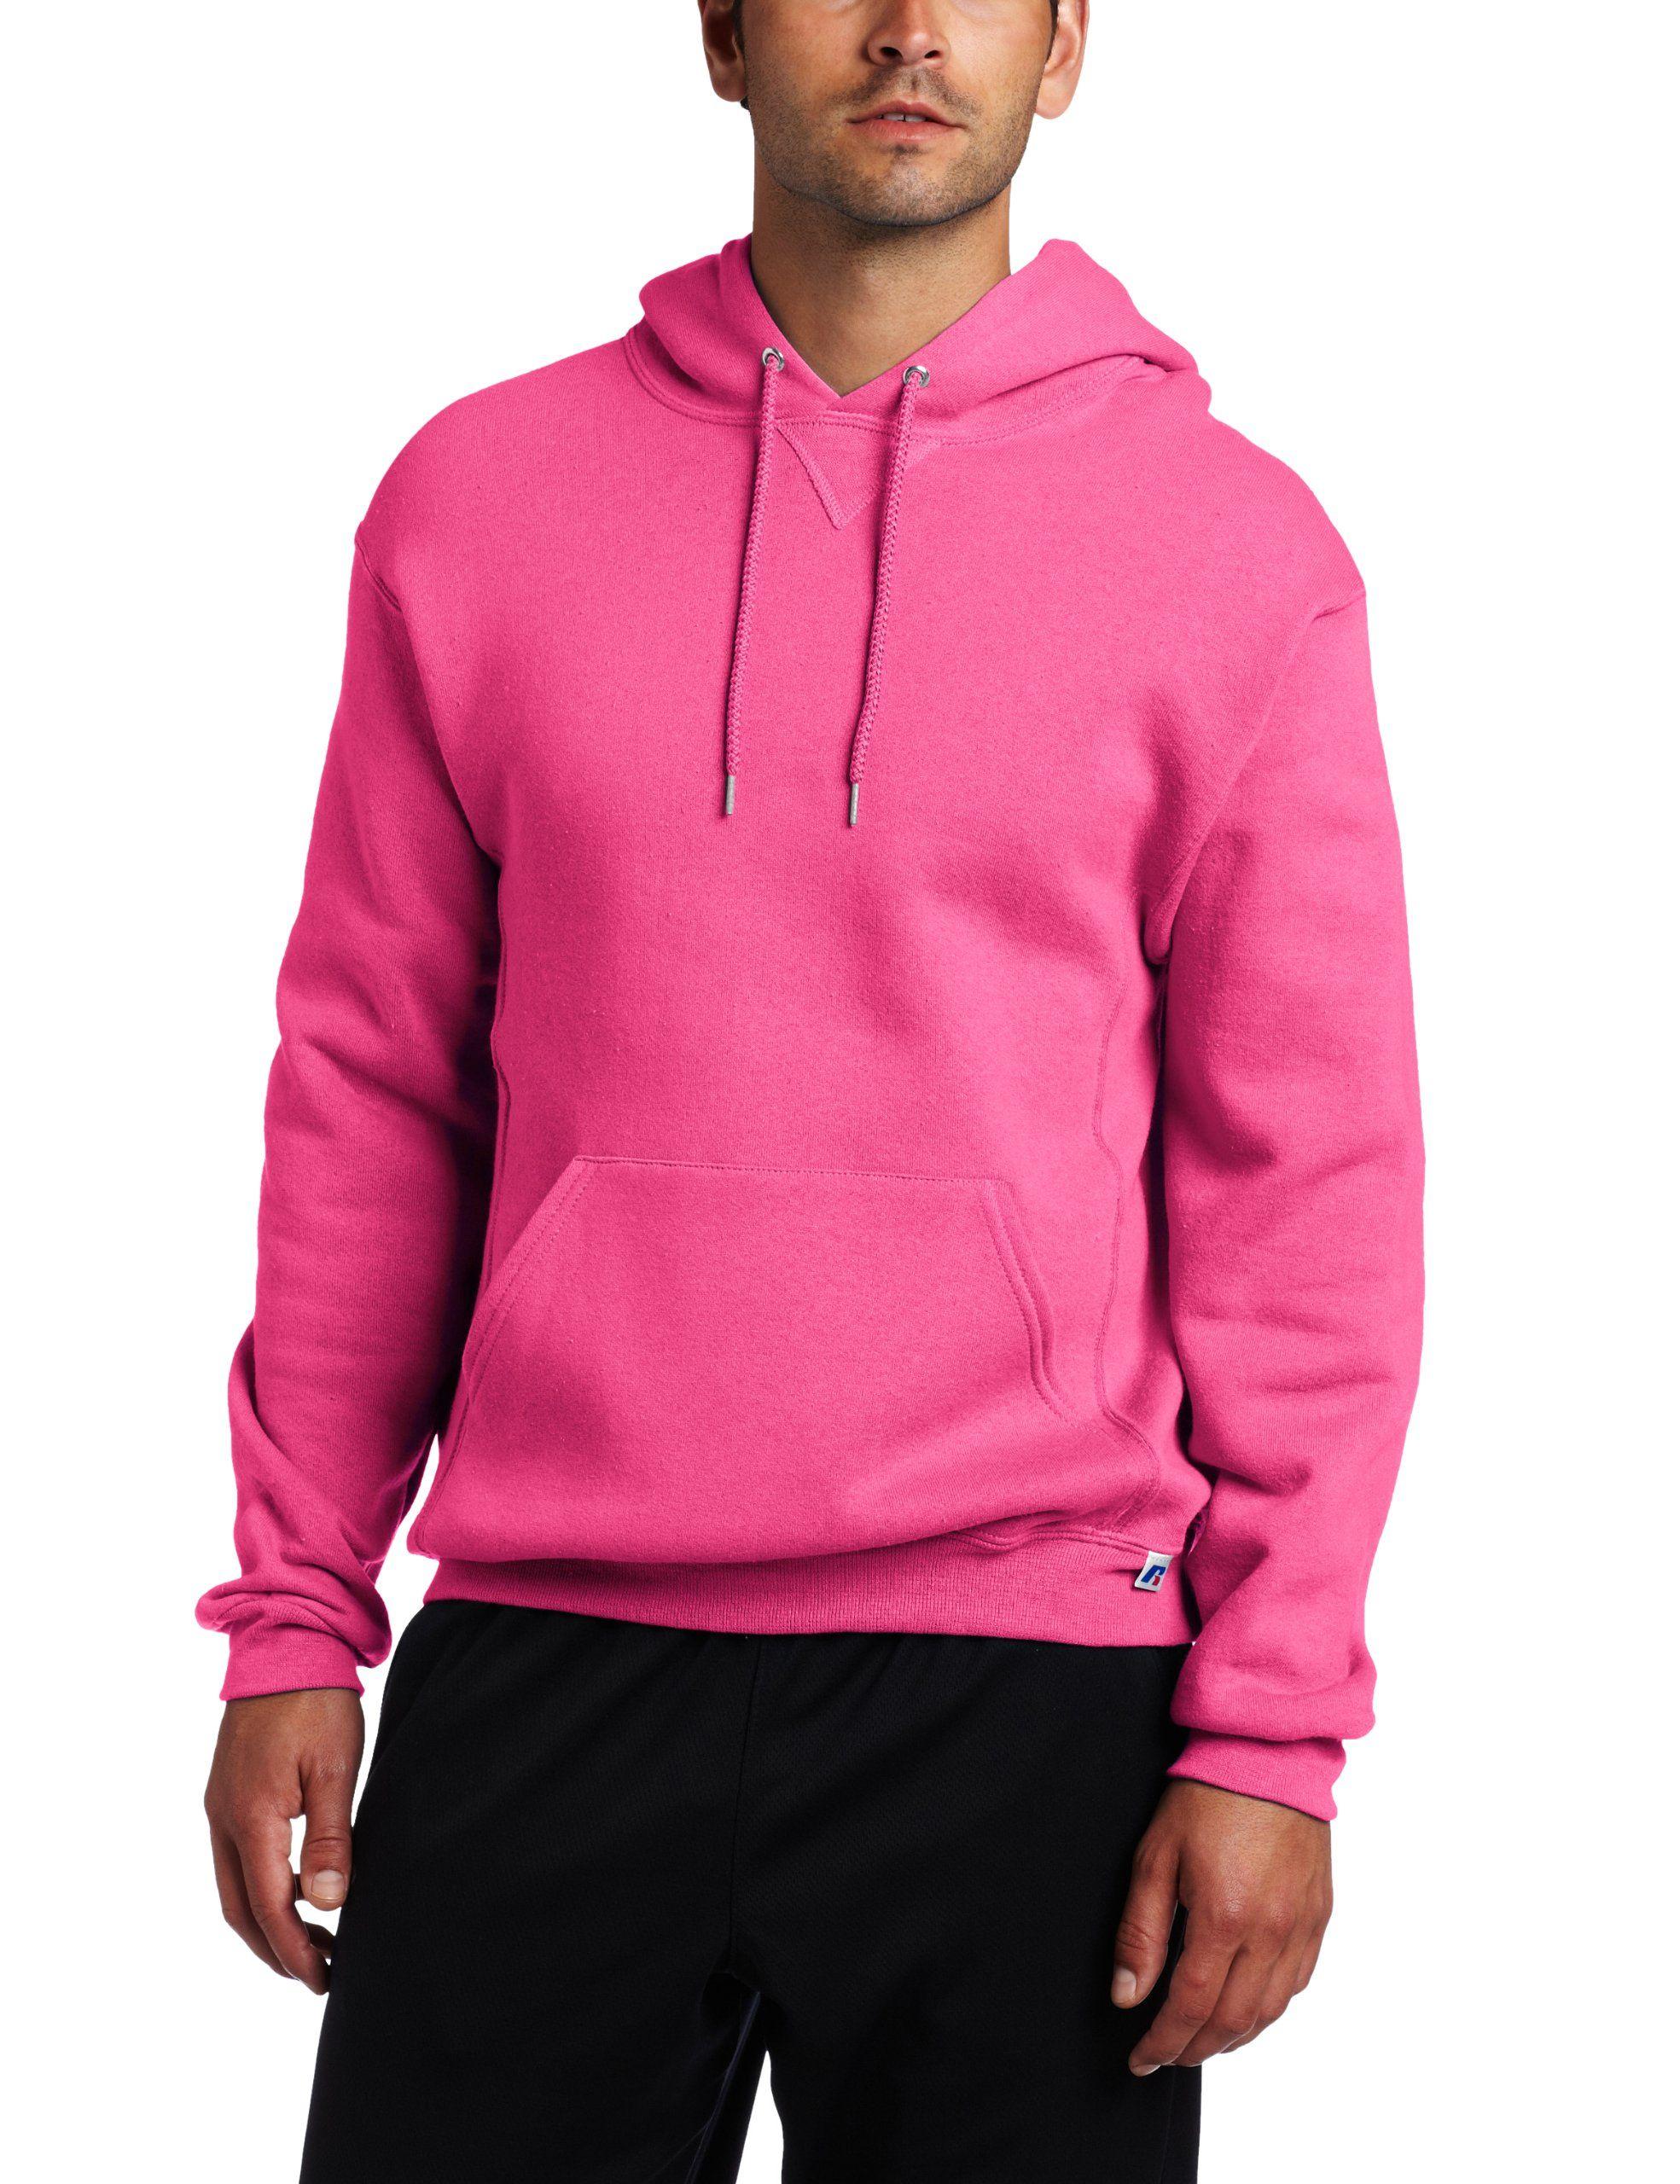 cba7d6cef19 Russell Athletic Men s Dri Power Hooded Pullover Fleece Sweatshirt ...